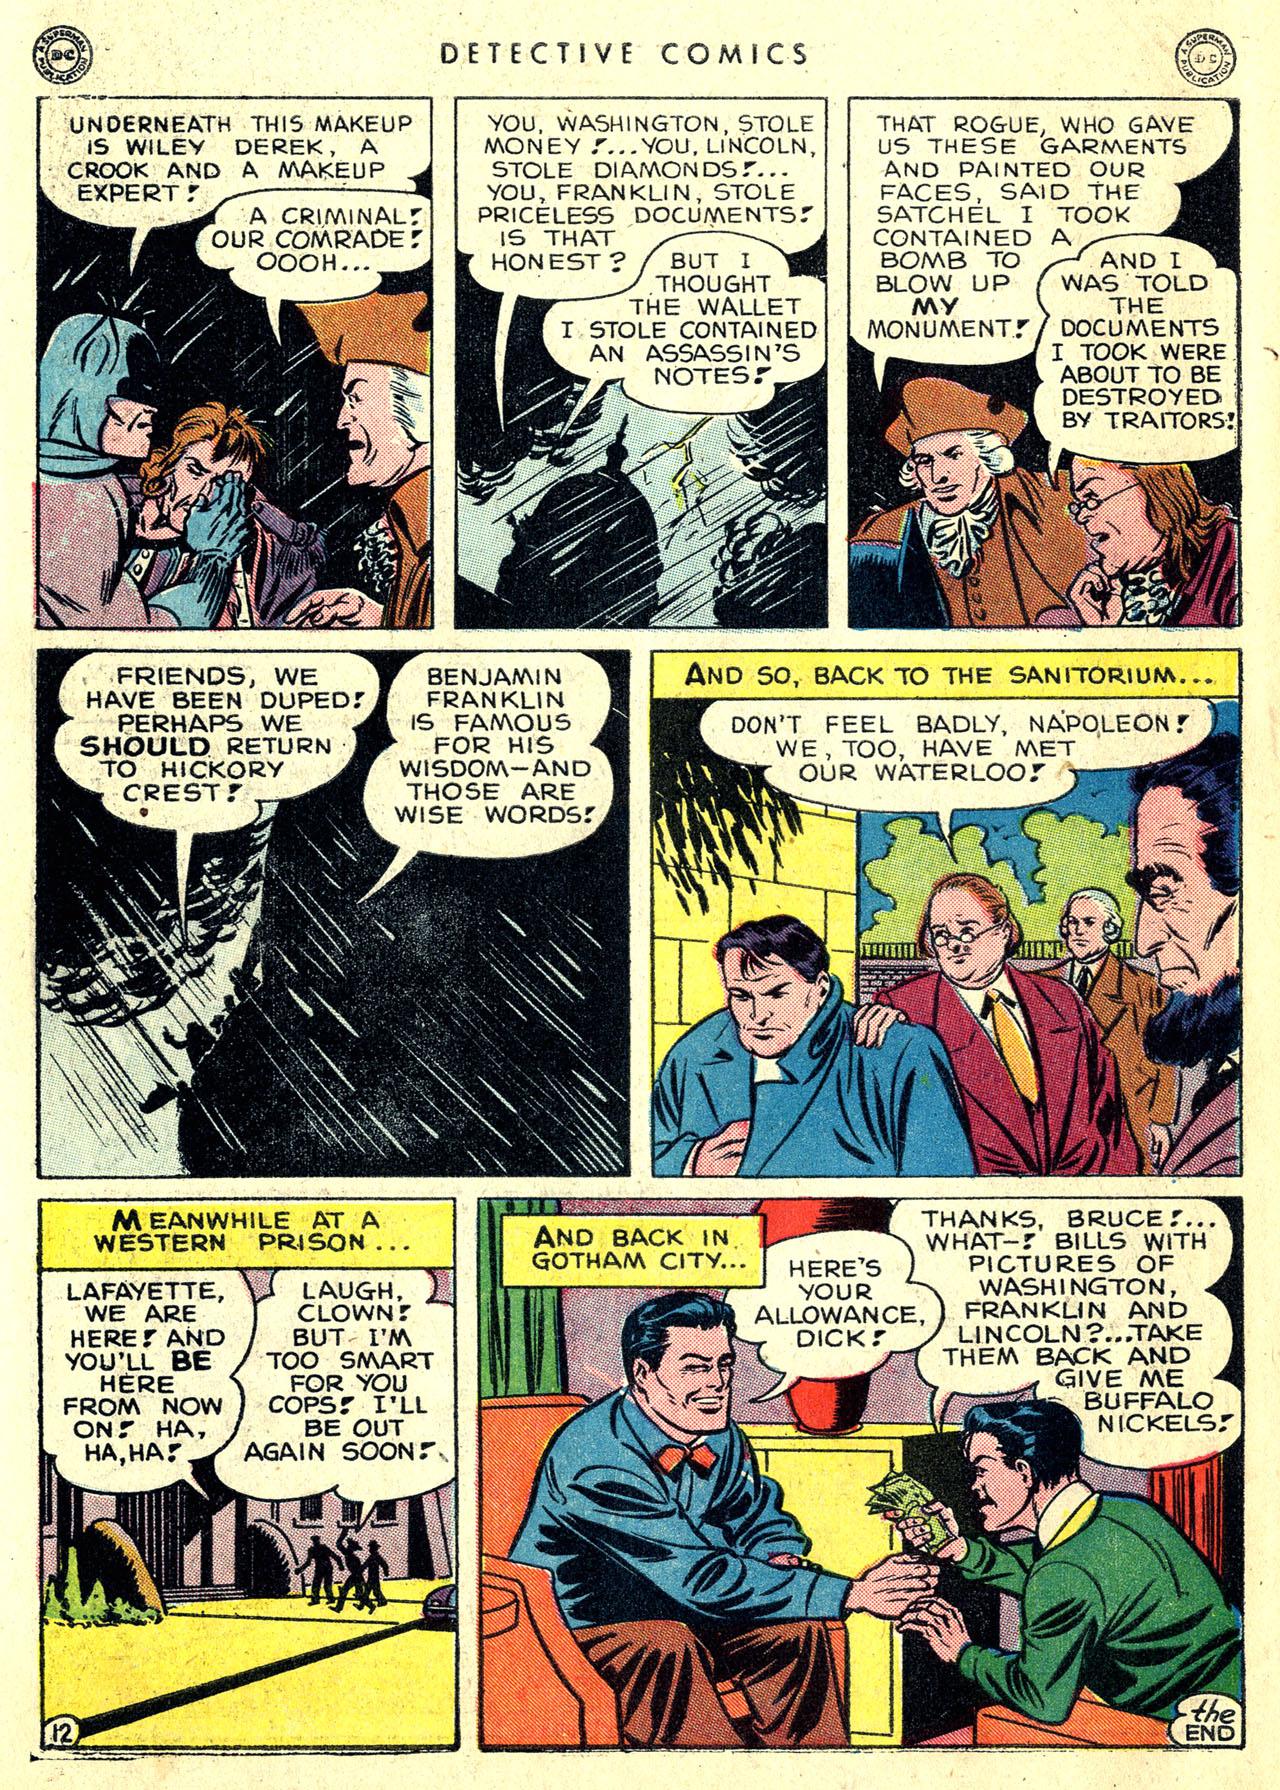 Detective Comics (1937) 119 Page 13